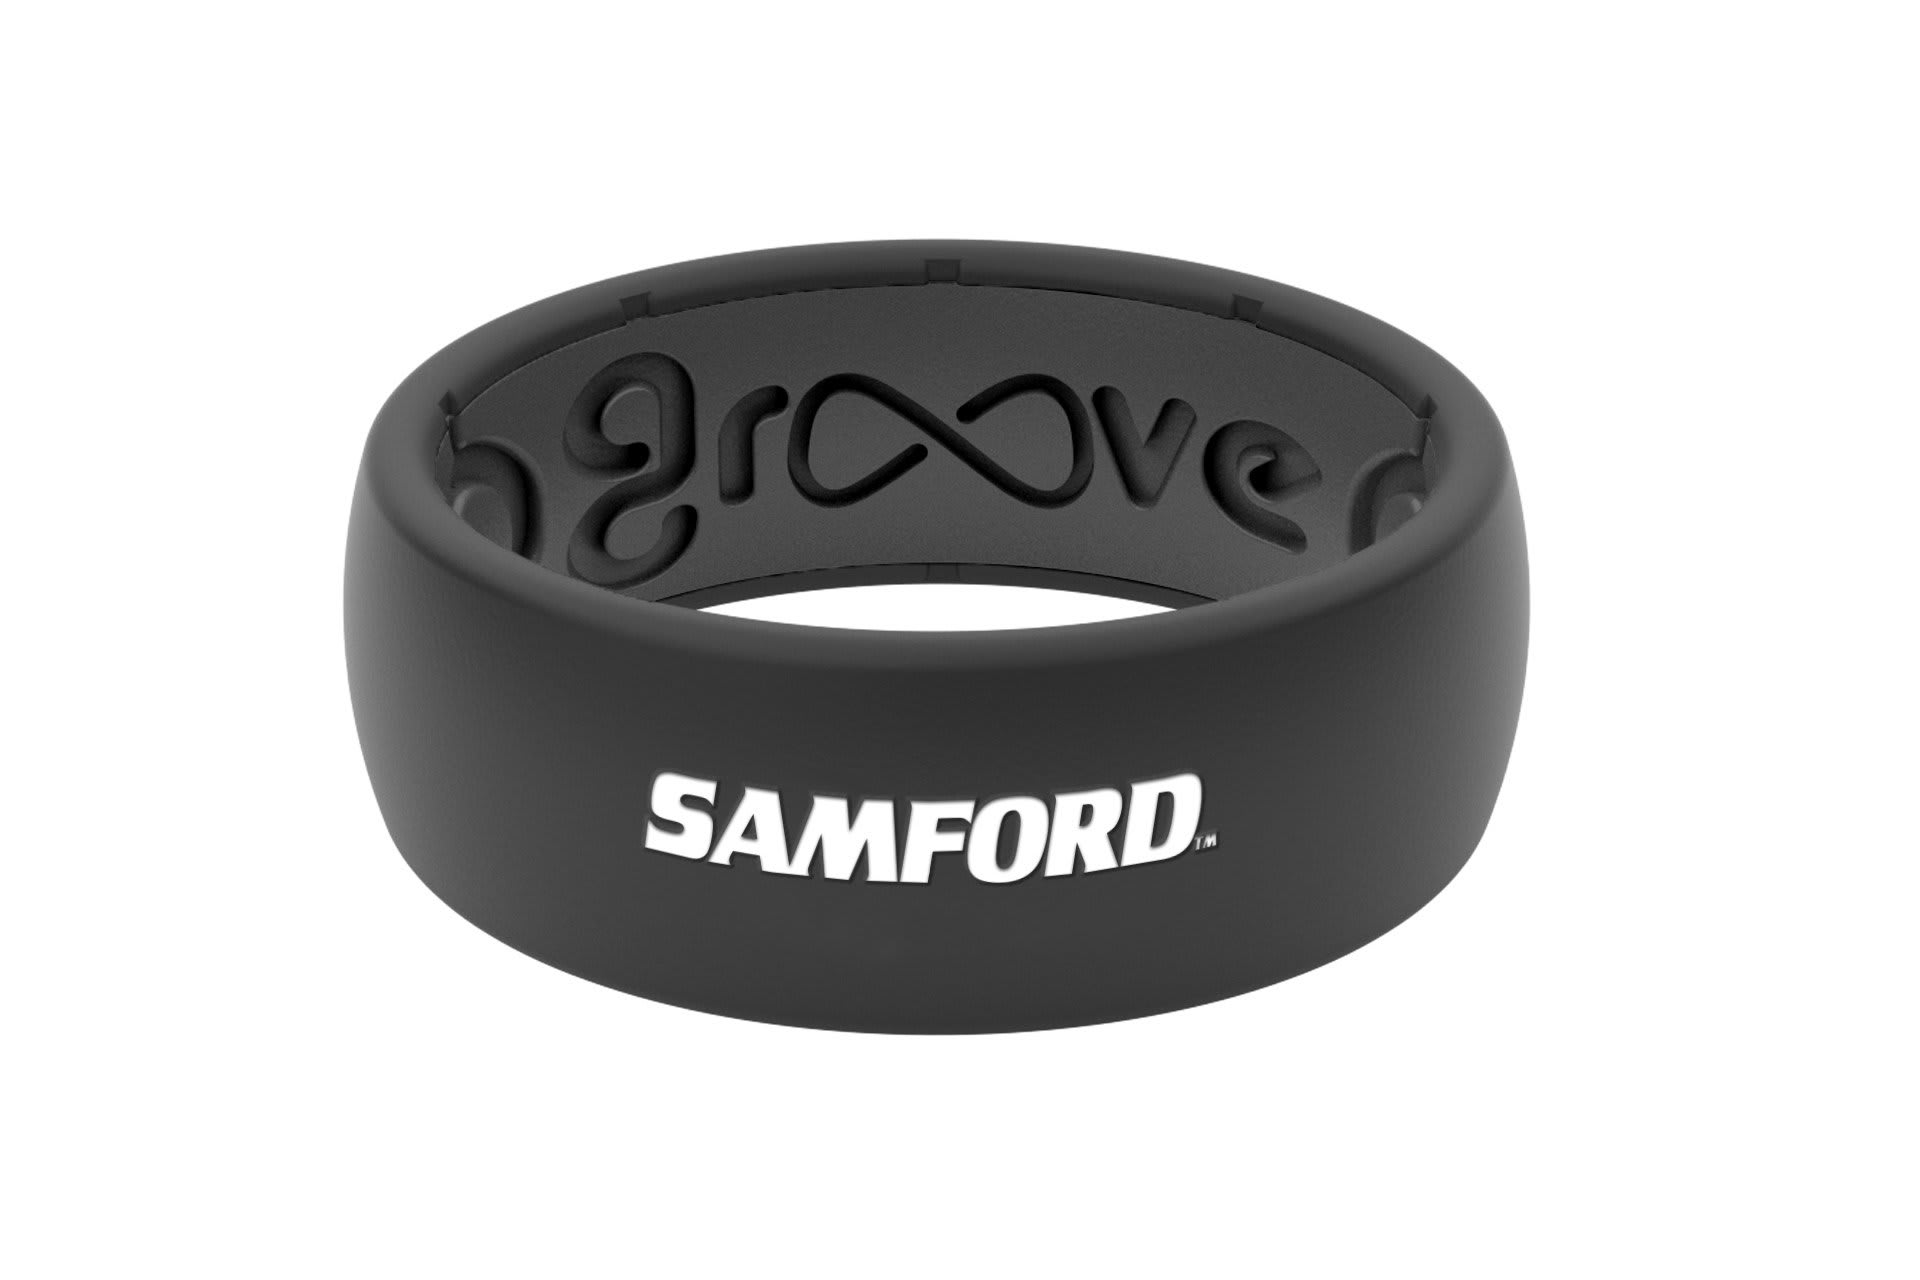 Original College Samford - Groove Life Silicone Wedding Rings